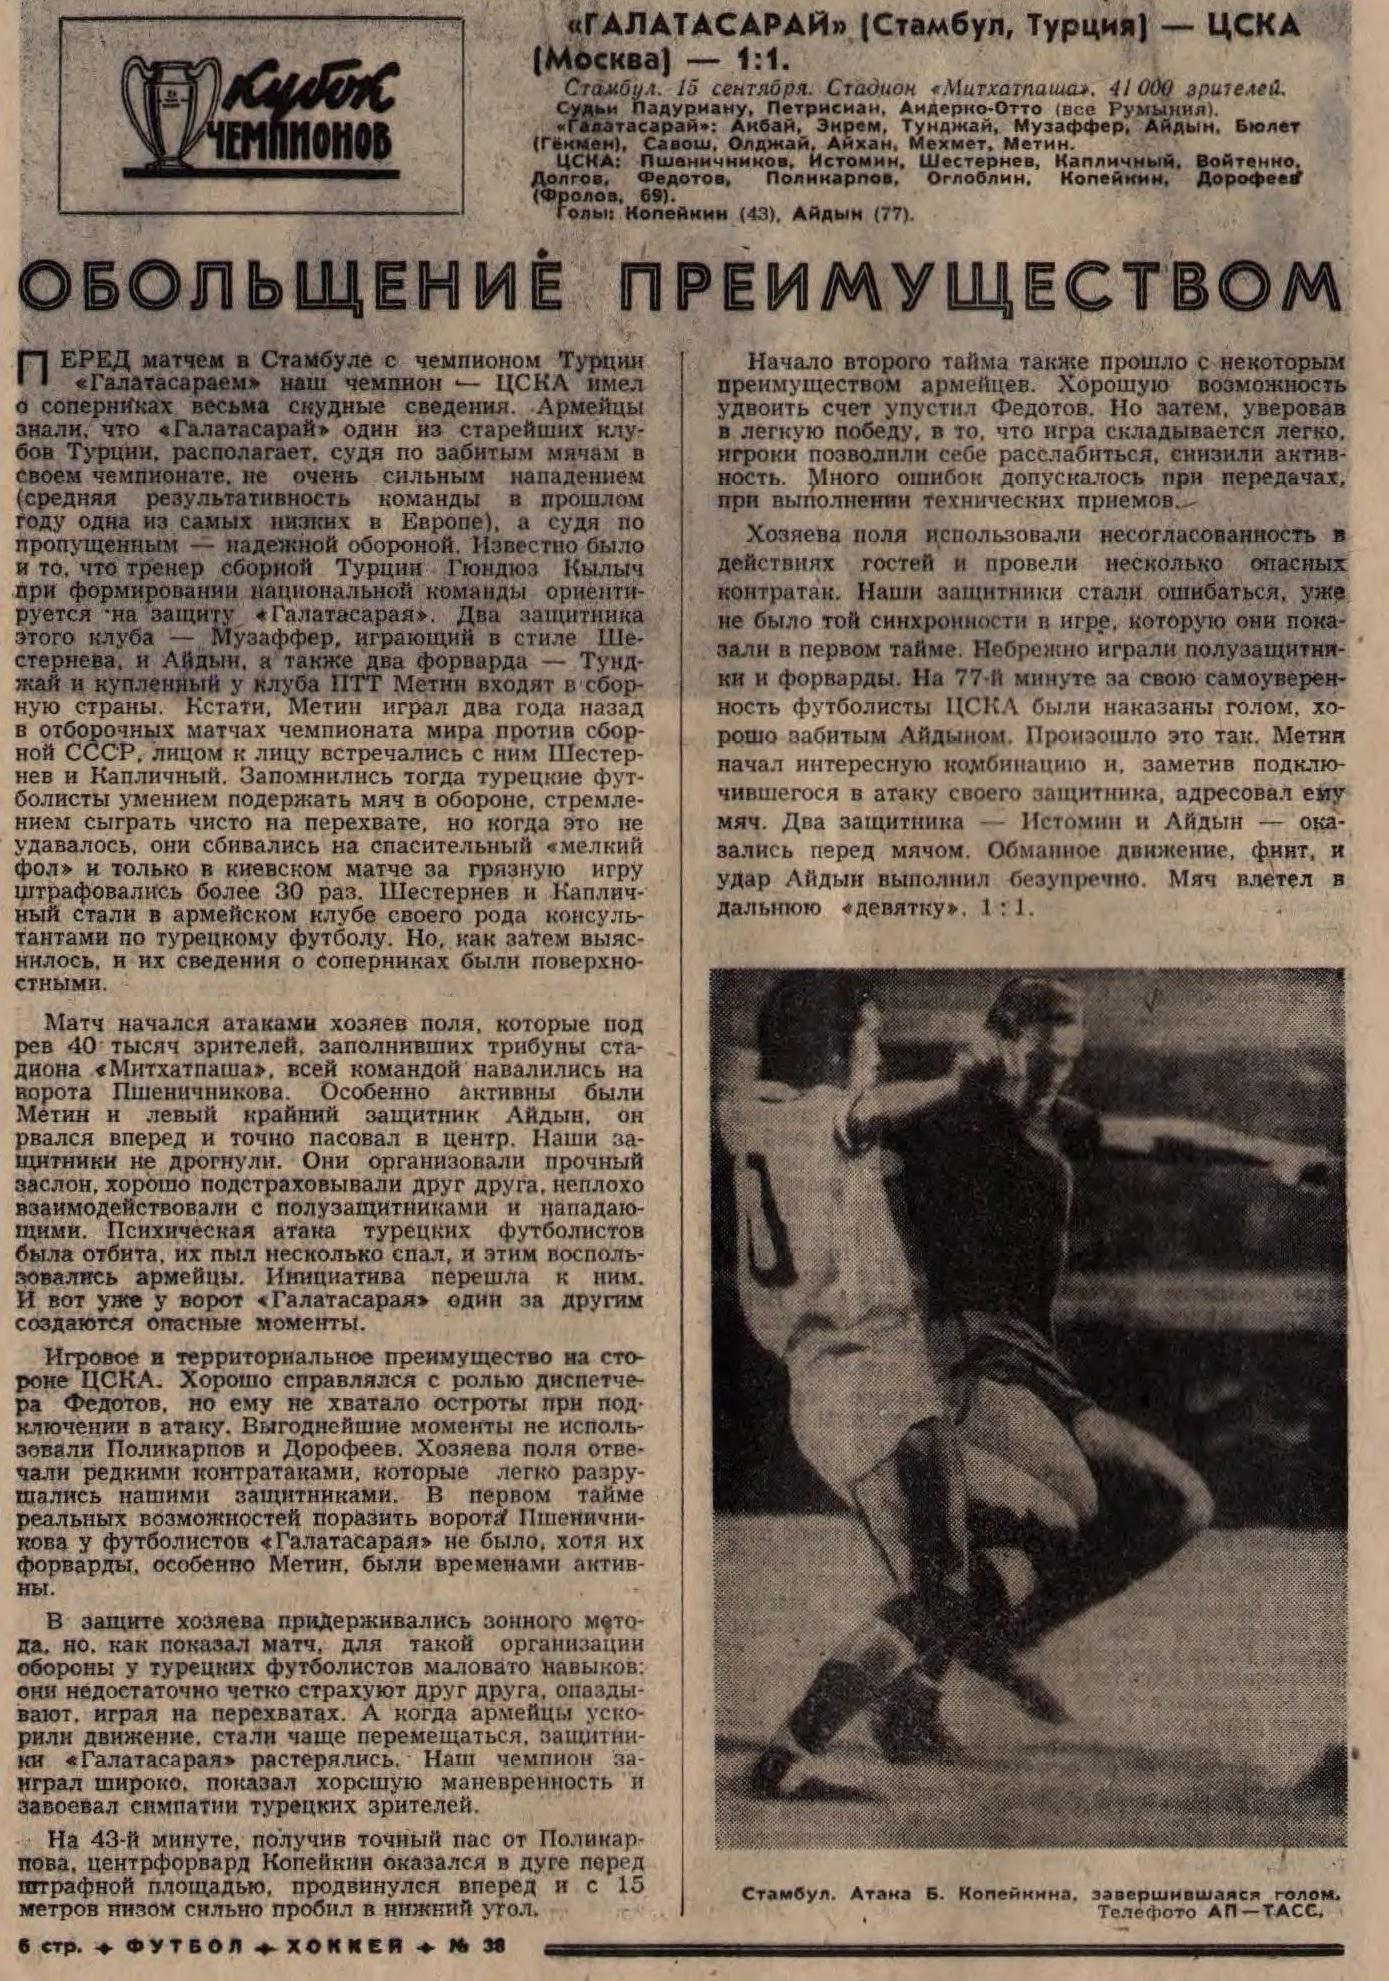 Галатасарай (Турция) - ЦСКА (СССР) 1:1